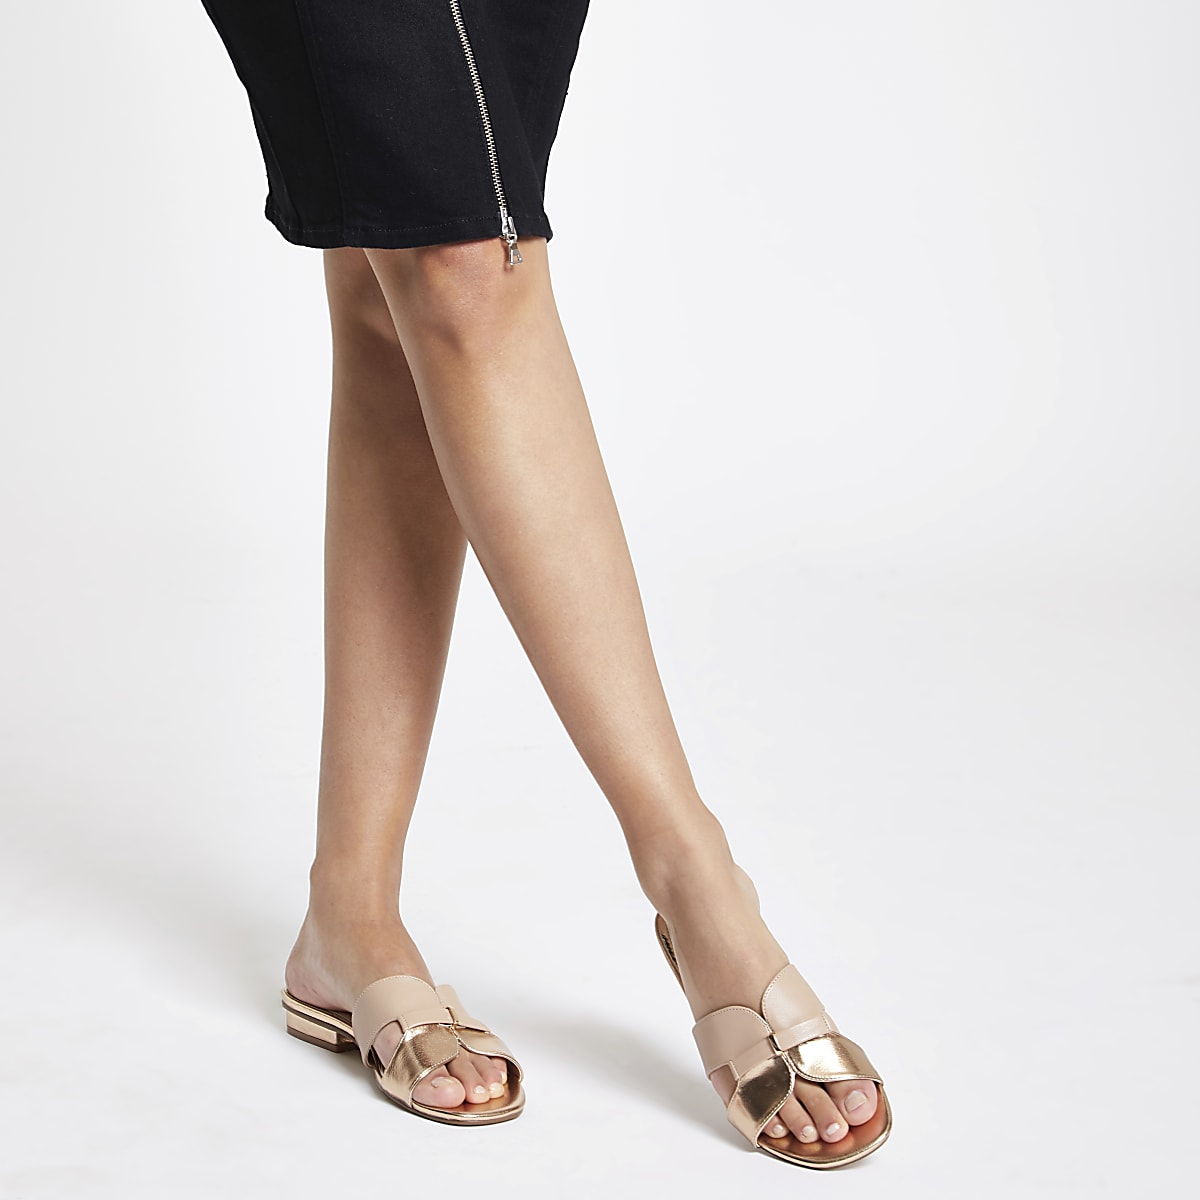 f26c90405ed Rose gold faux leather flat mule sandals - Sandals - Shoes   Boots ...